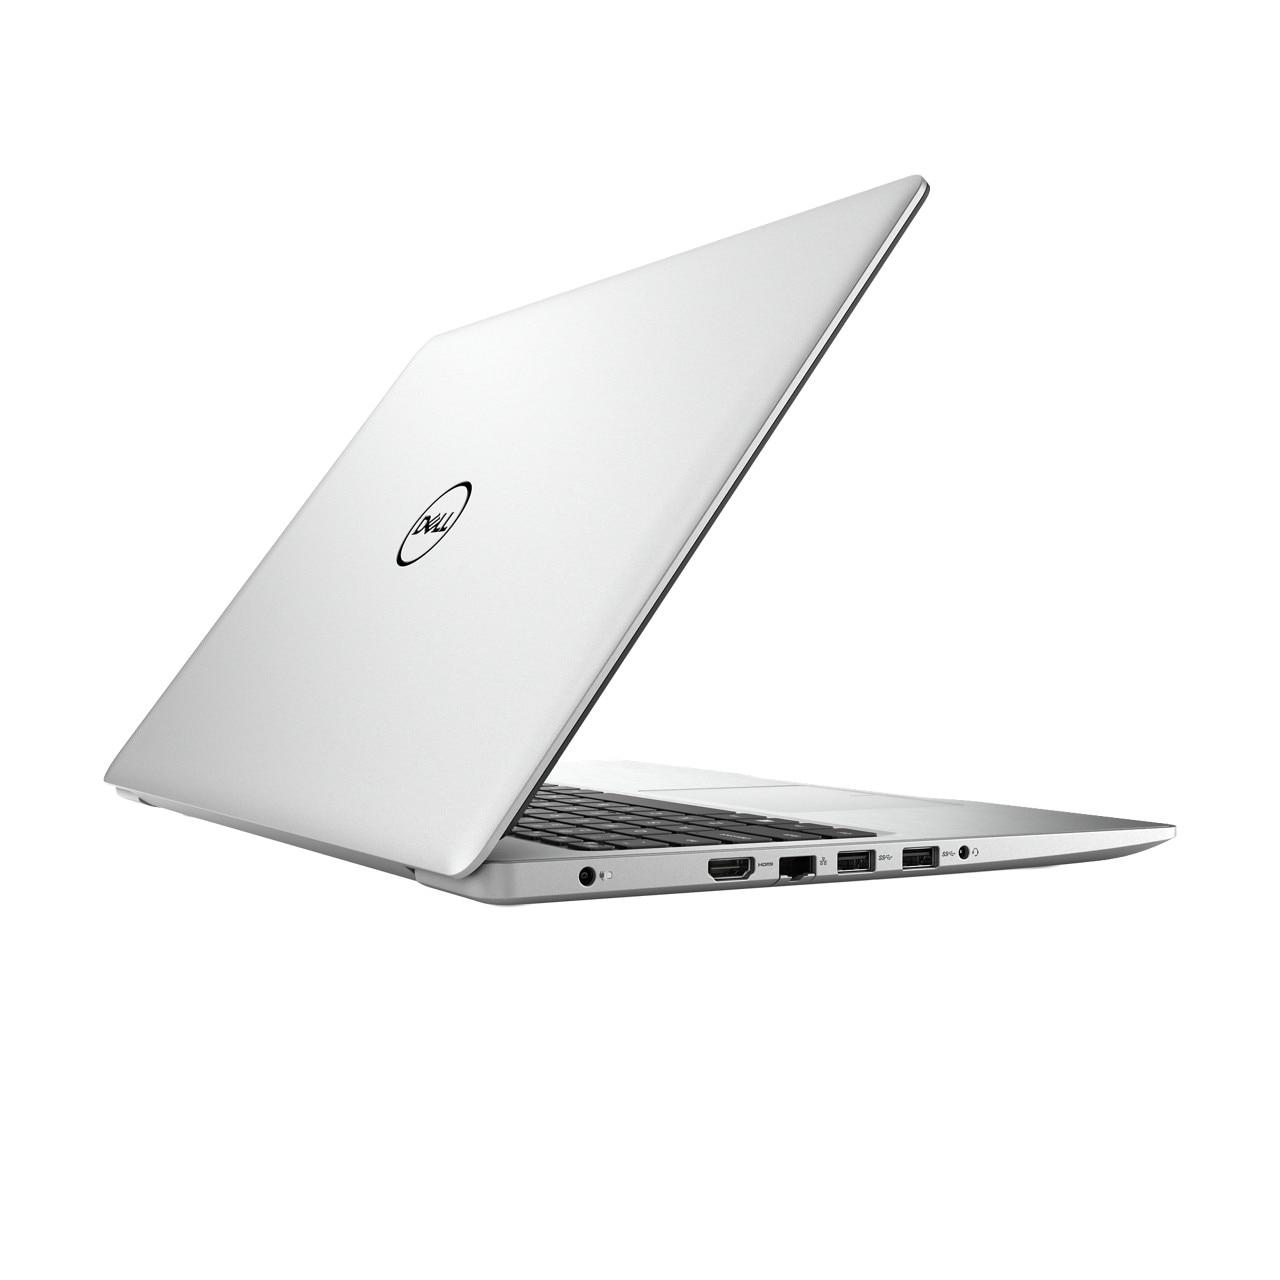 Dell Inspiron 5570 15.6-inch (2018) - Core i7-8550U - 16 GB - HDD 2 TB